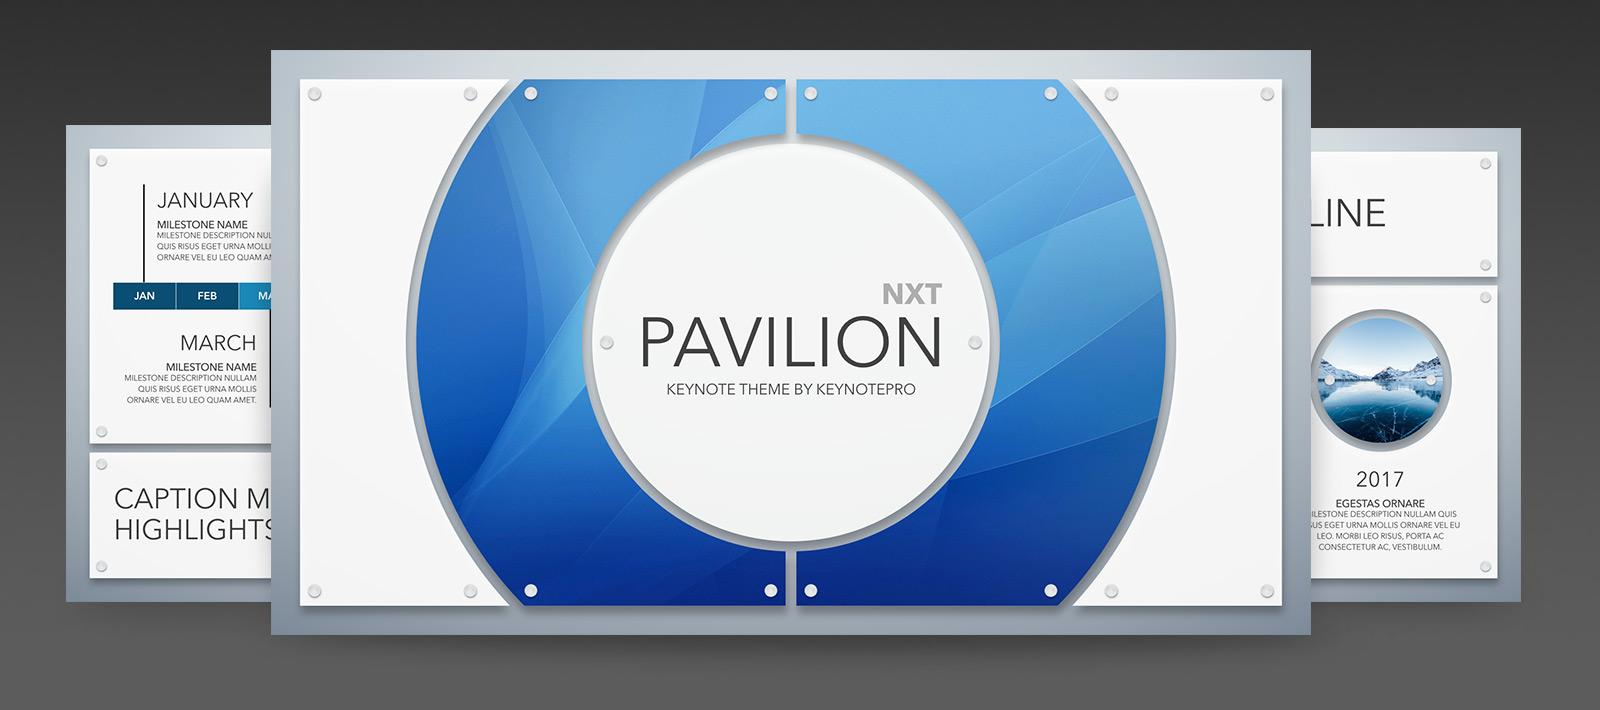 keynotepro keynote themes pavilion nxt